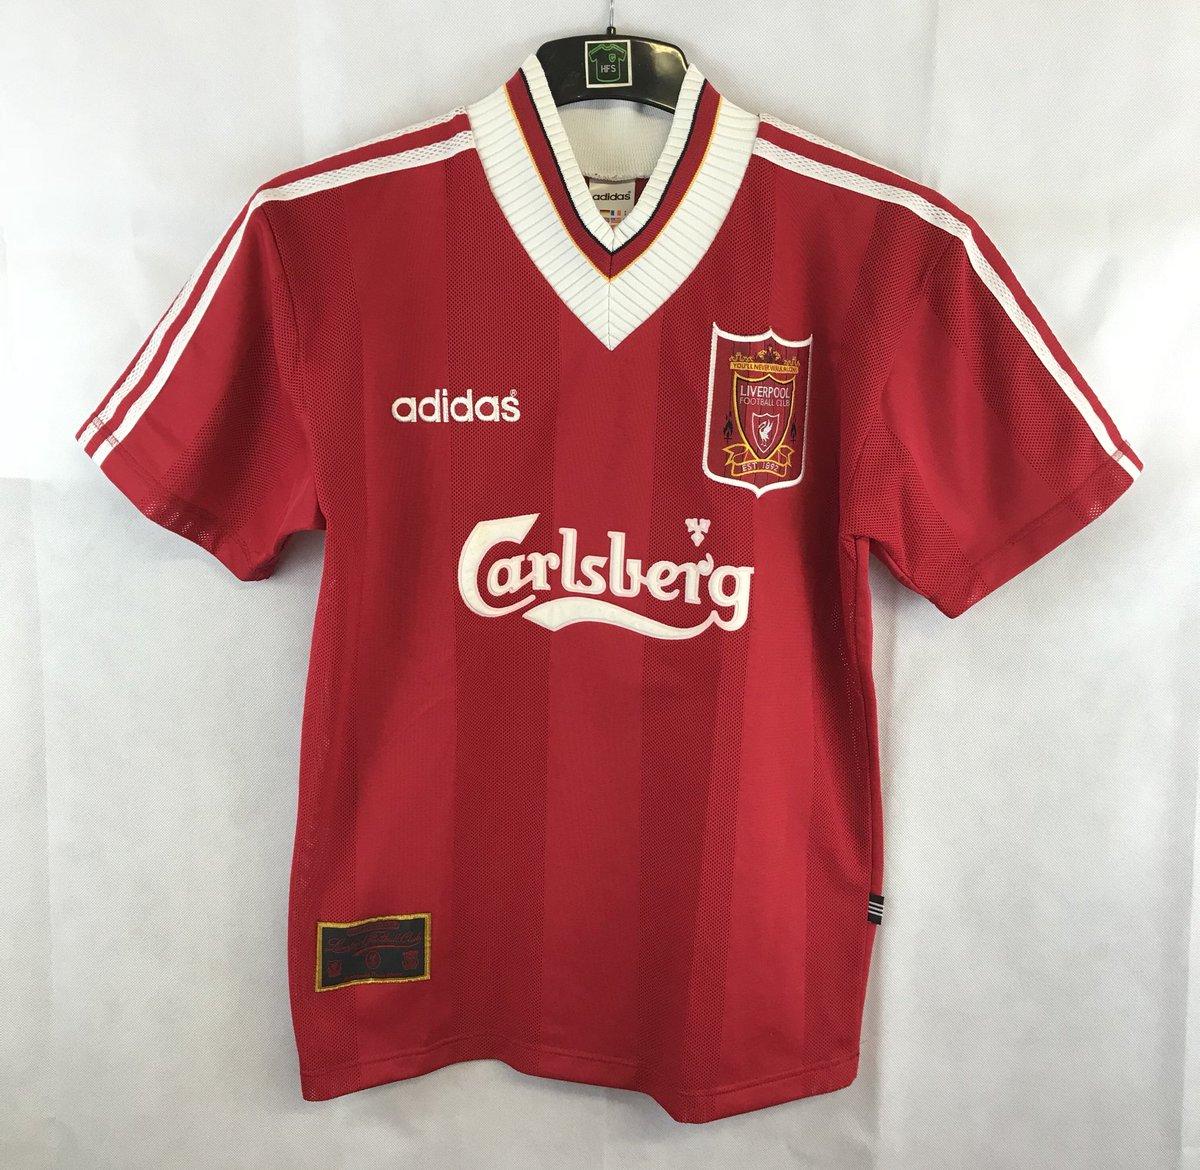 ... Football Shirt 1995 96 Adults Small Adidas  http   historicfootballshirts.co.uk shop liverpool-home-football-shirt-1995- 96-adults-small-adidas  … f9d3a4259